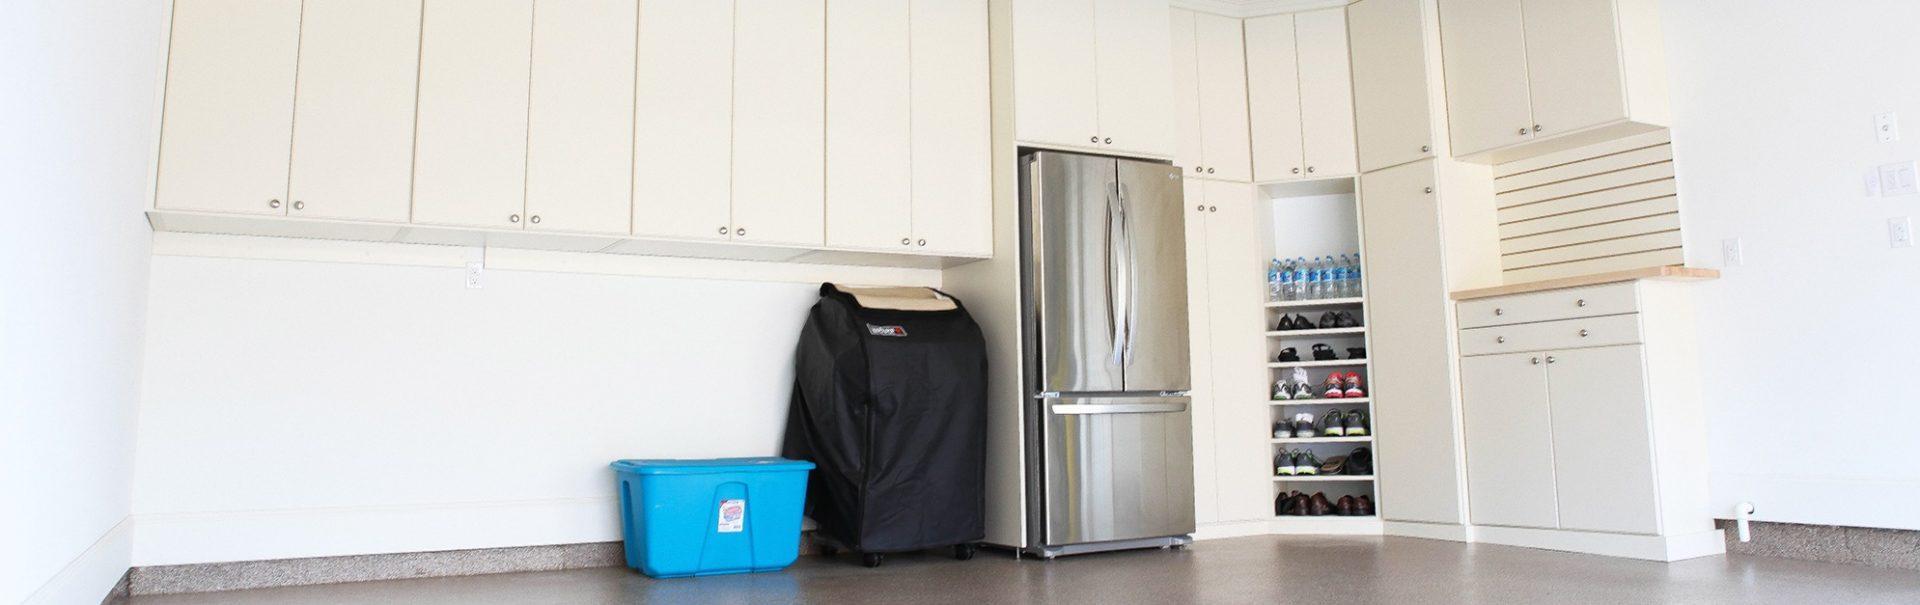 diplomat-closet-garage-slider